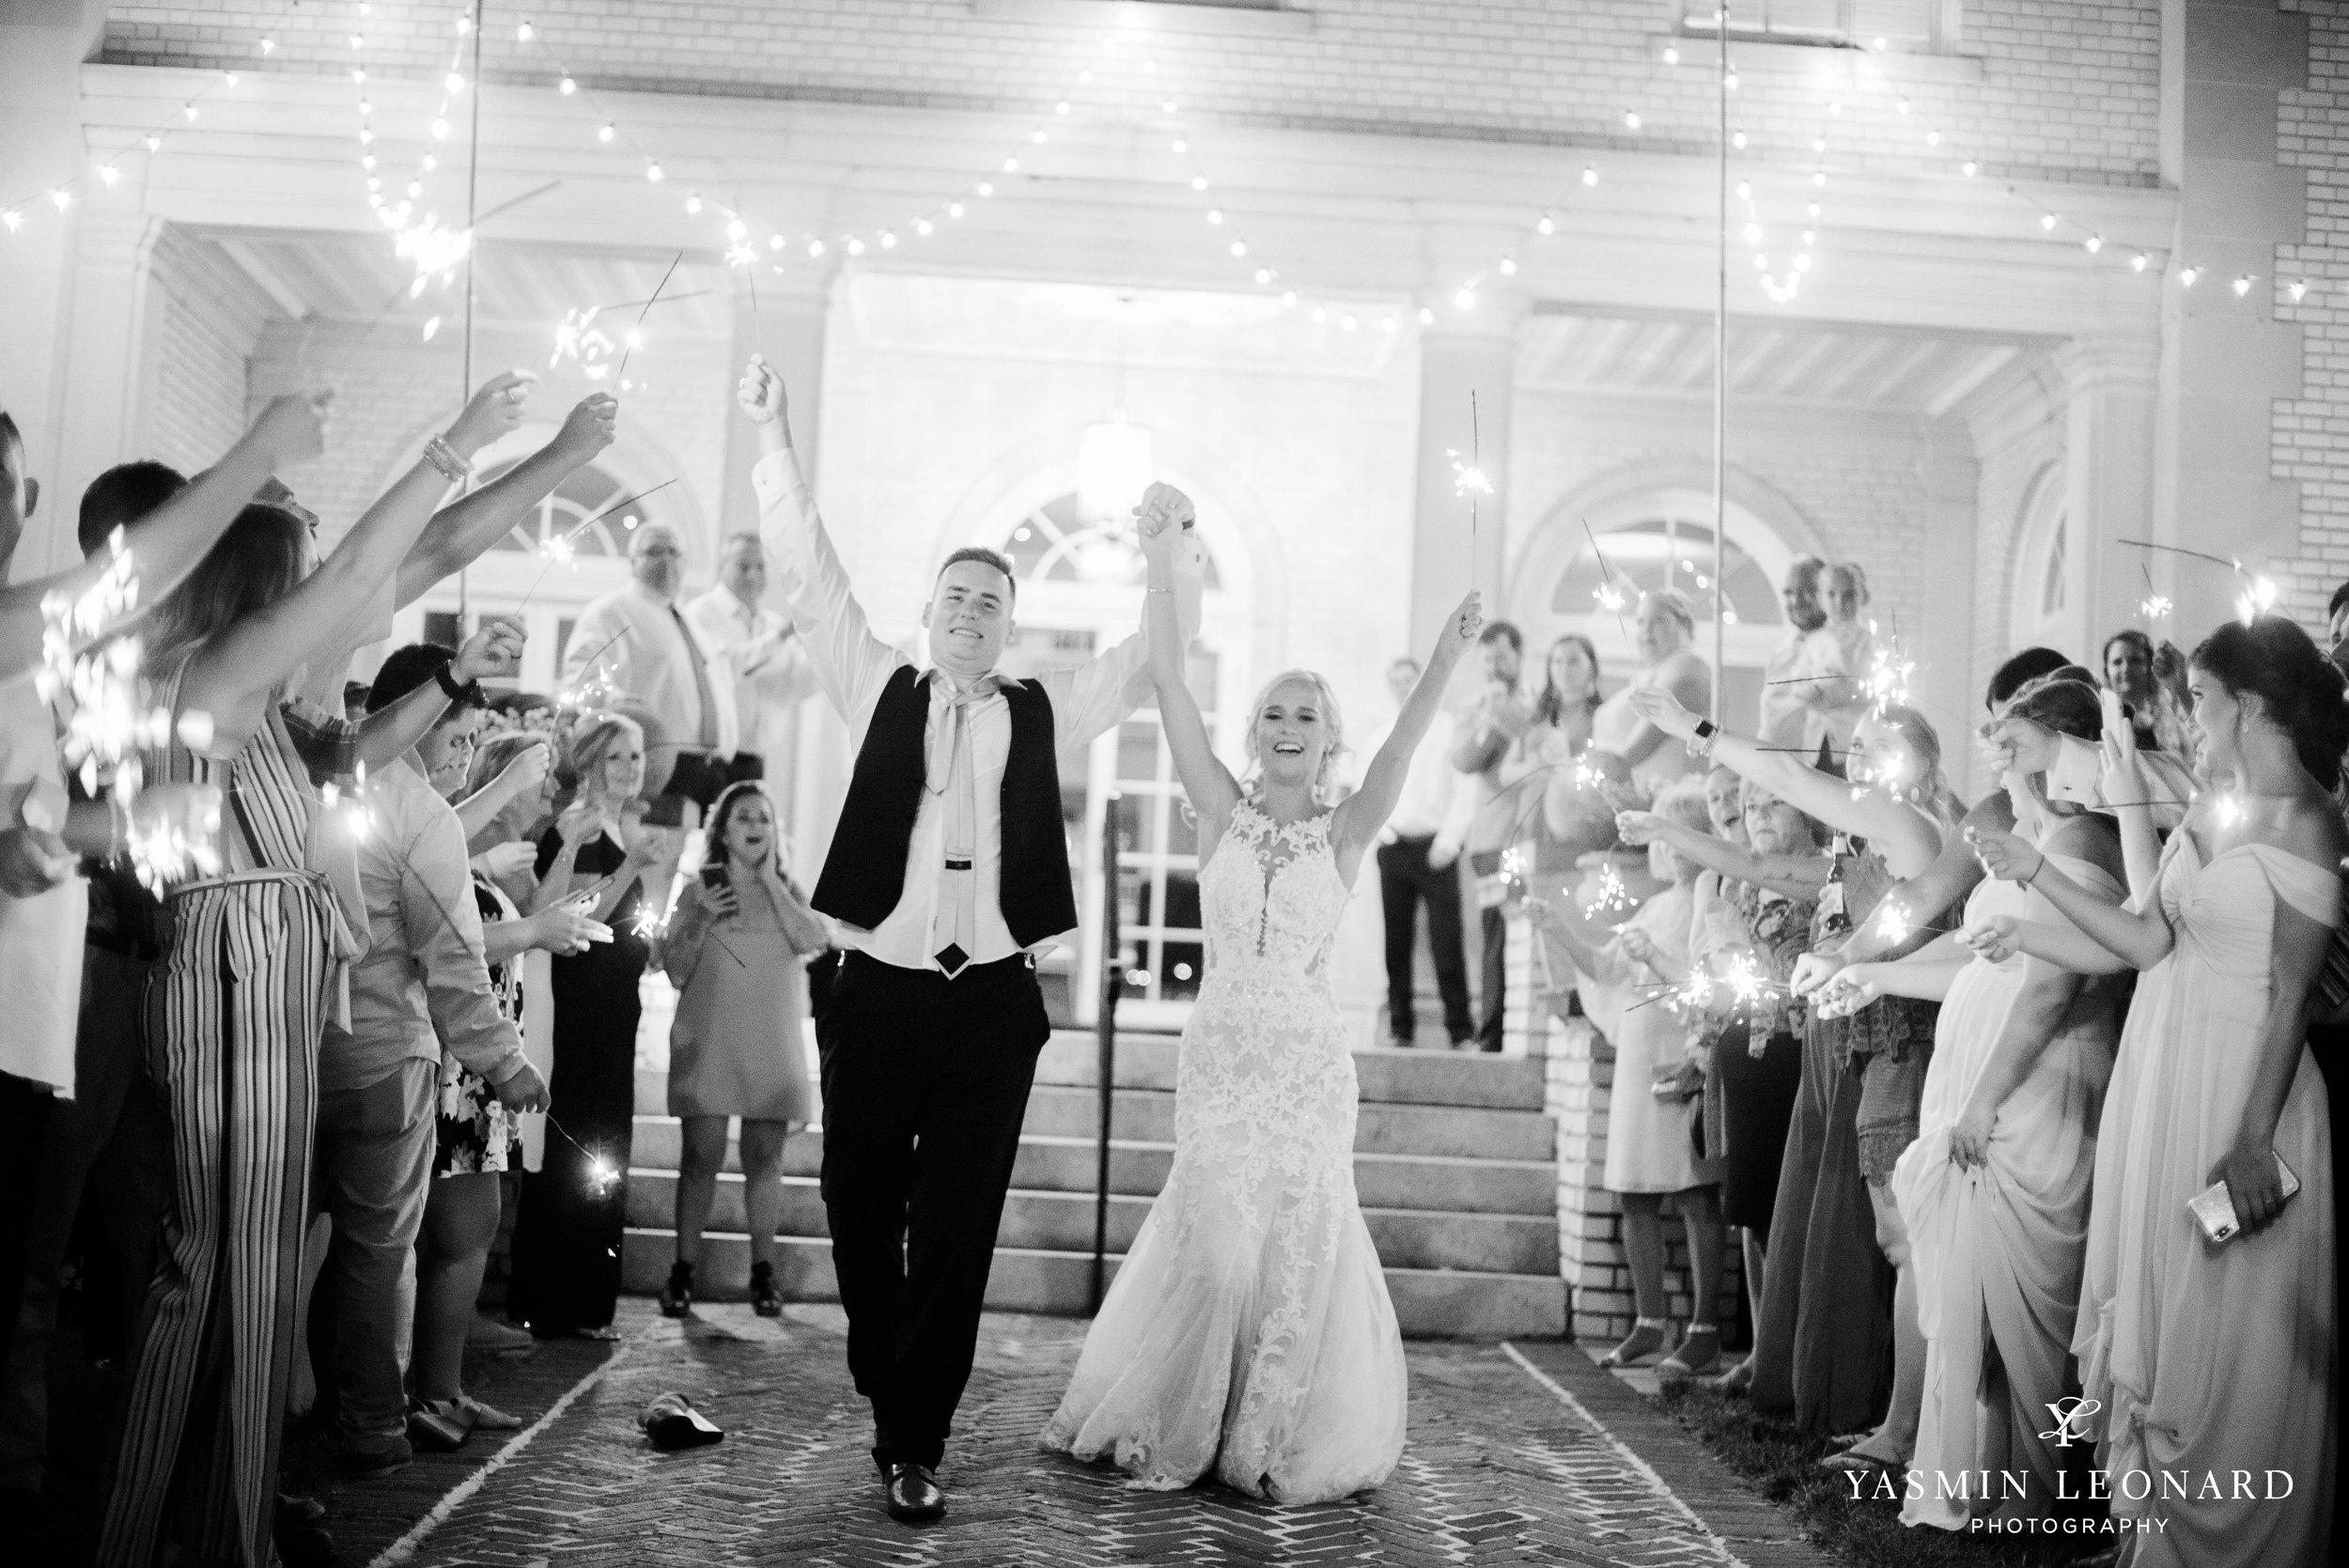 Separk Mansion - NC Weddings - Gastonia Wedding - NC Wedding Venues - Pink and Blue Wedding Ideas - Pink Bridesmaid Dresses - Yasmin Leonard Photography-73.jpg